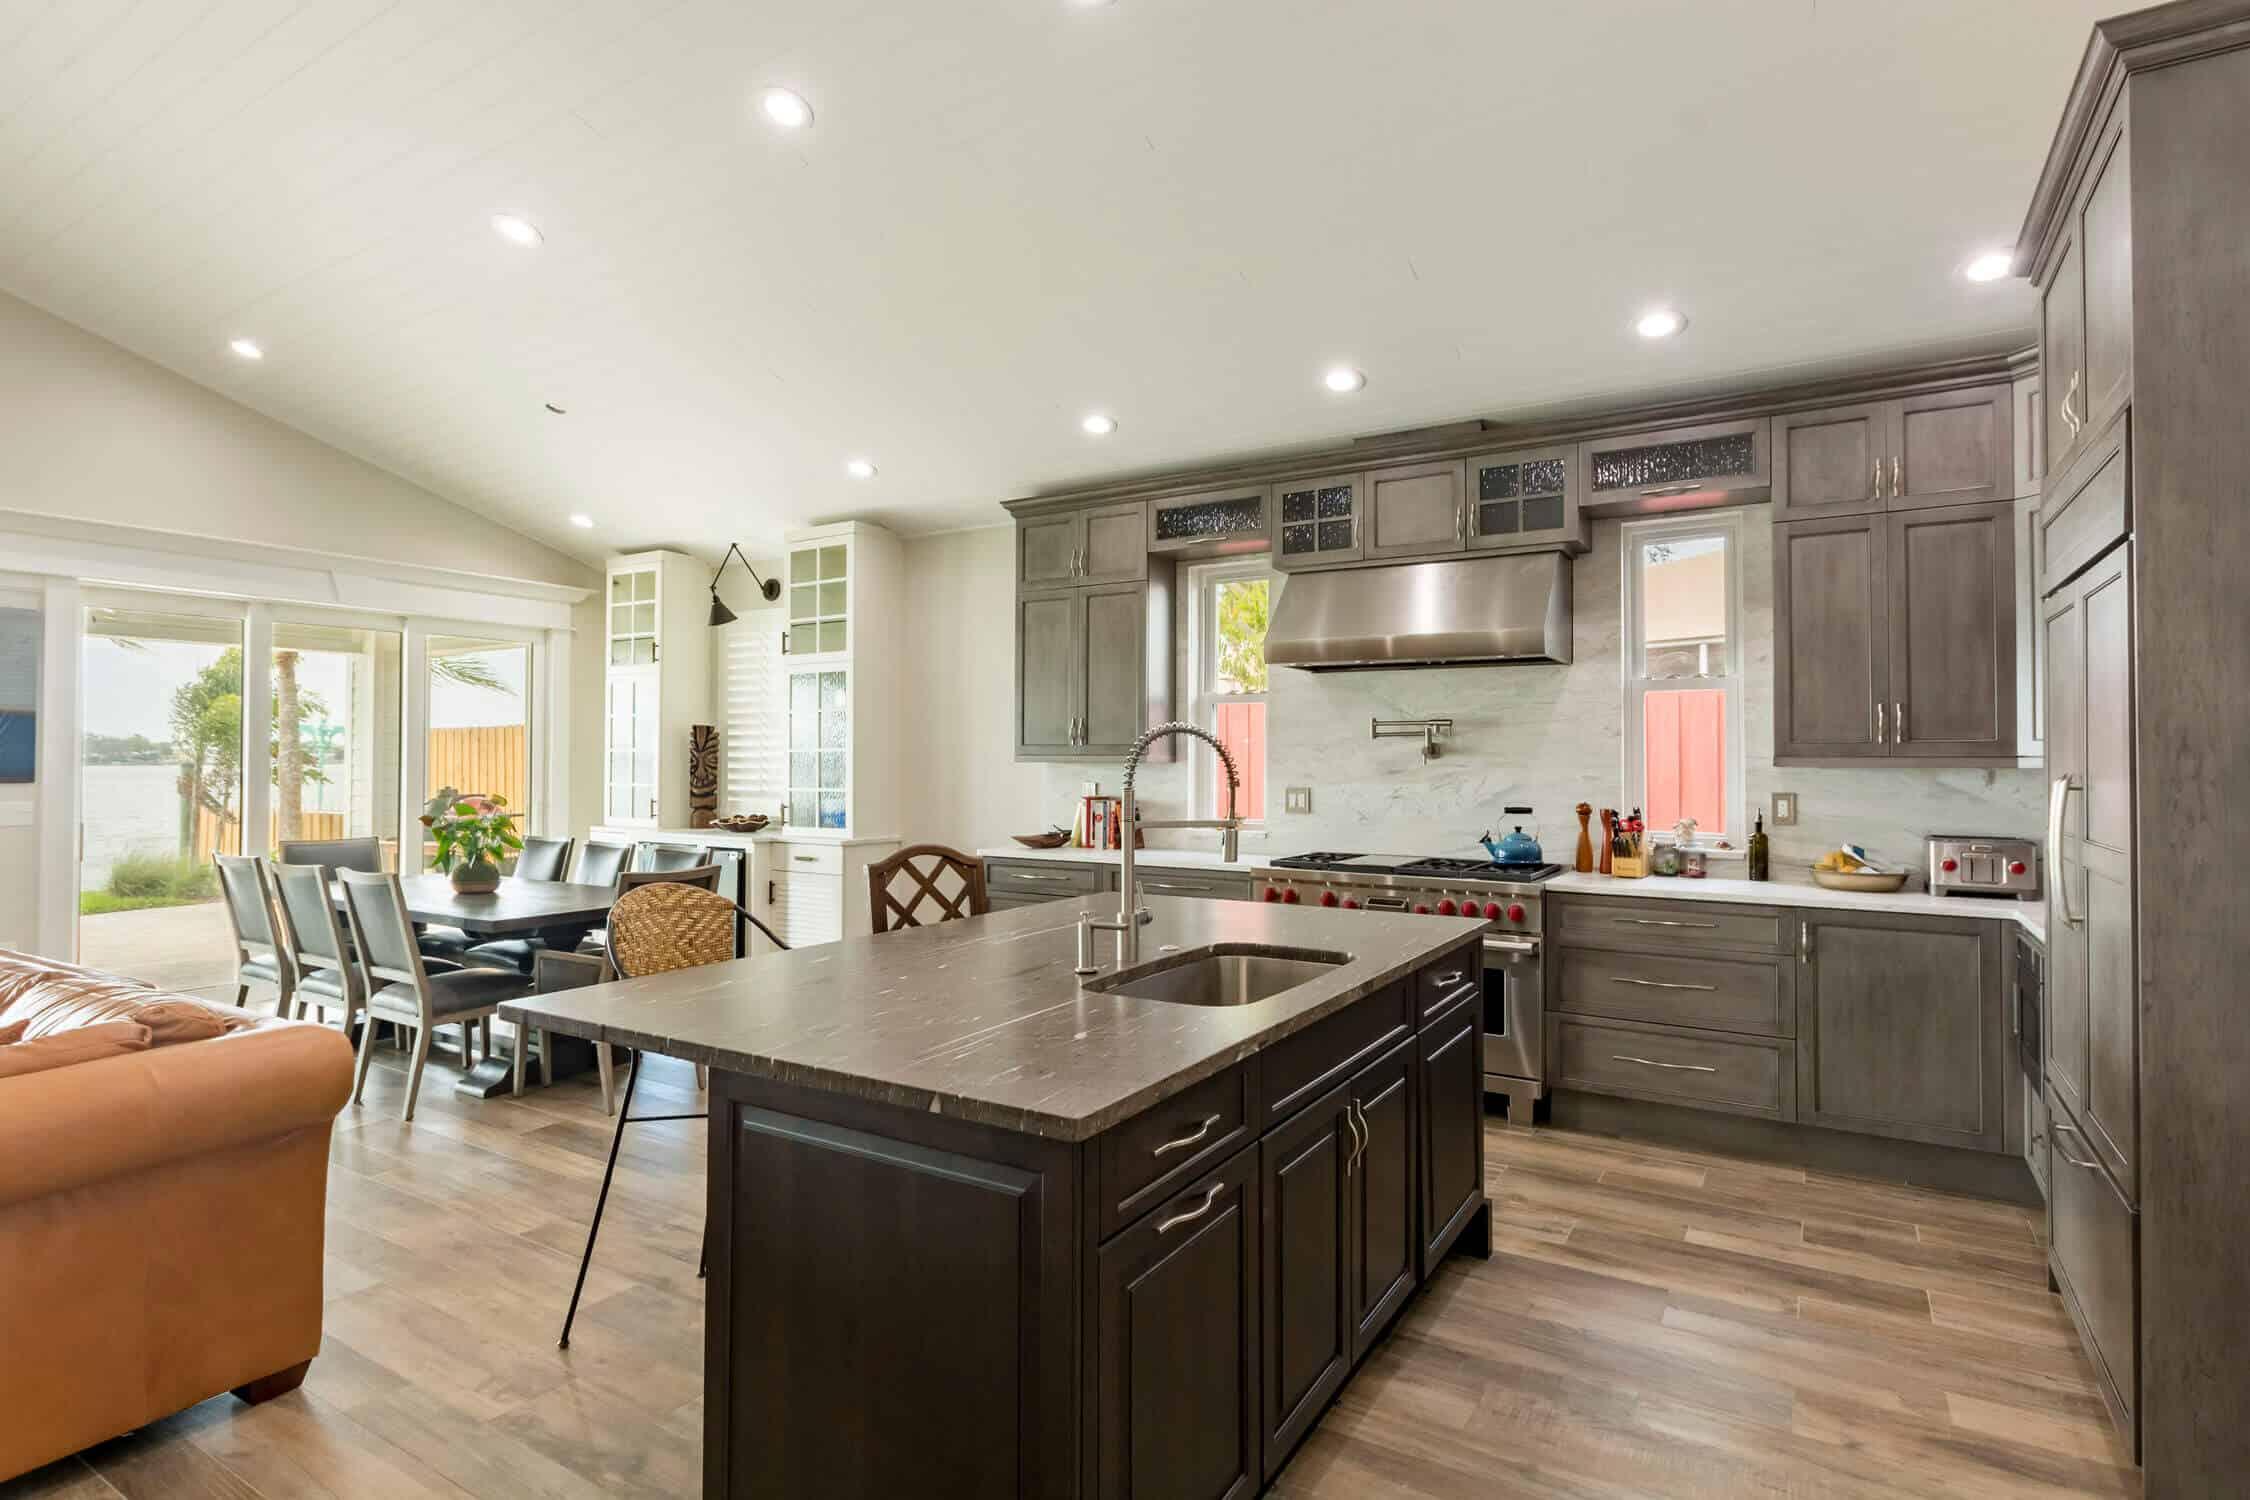 Simple but Elegant Kitchen